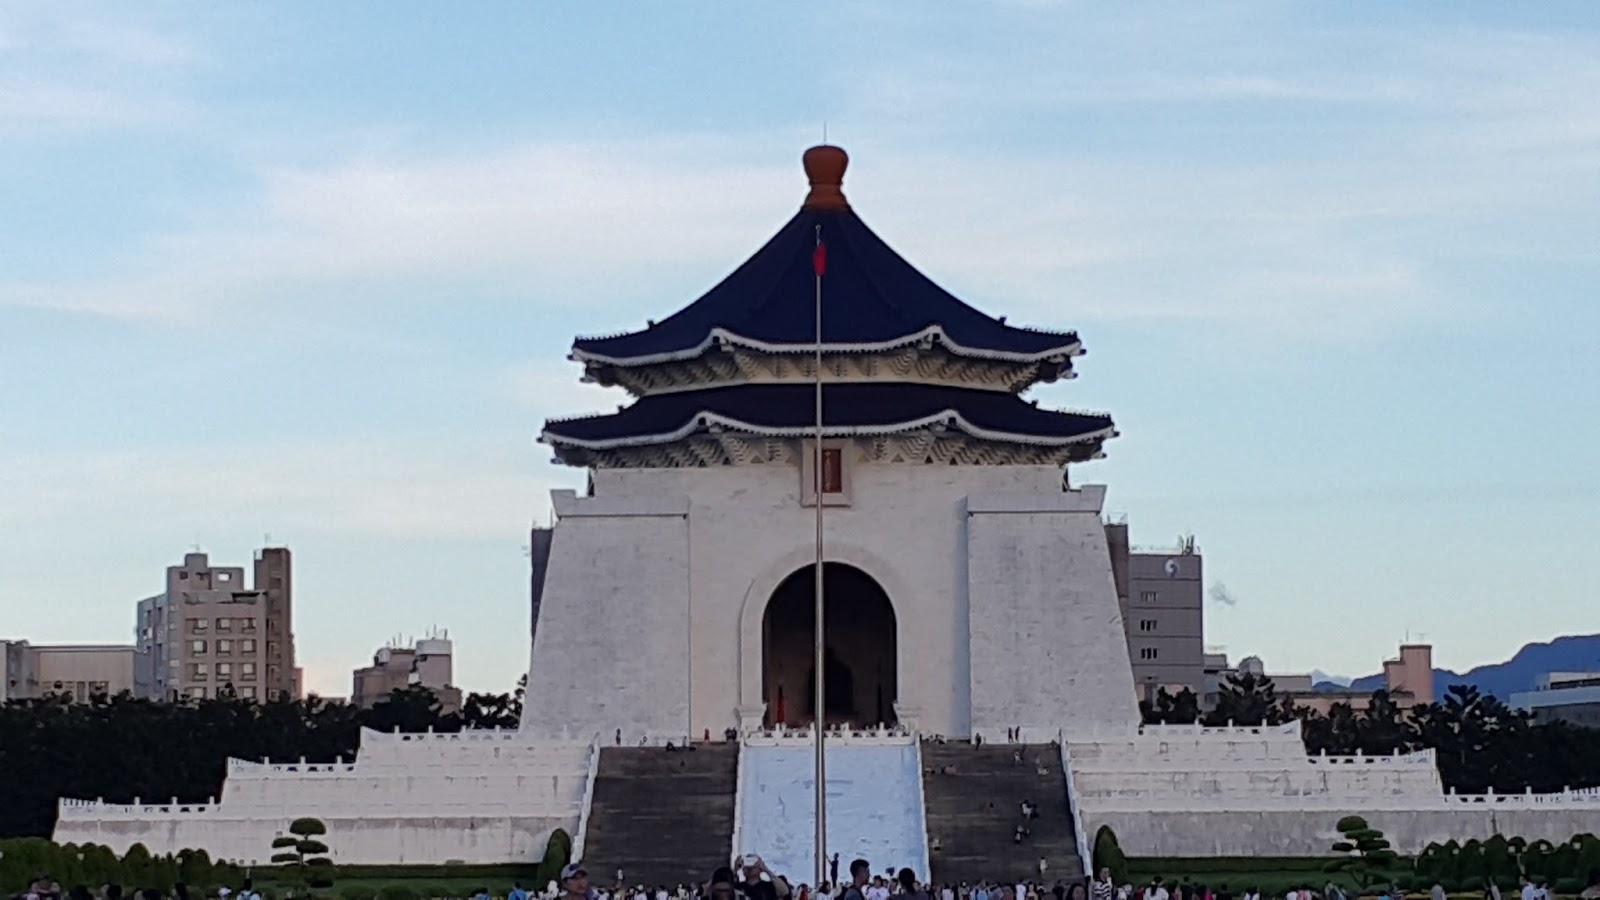 Ramble Taipei 漫步臺北: 【那些年臺灣的中國宮殿式建築】